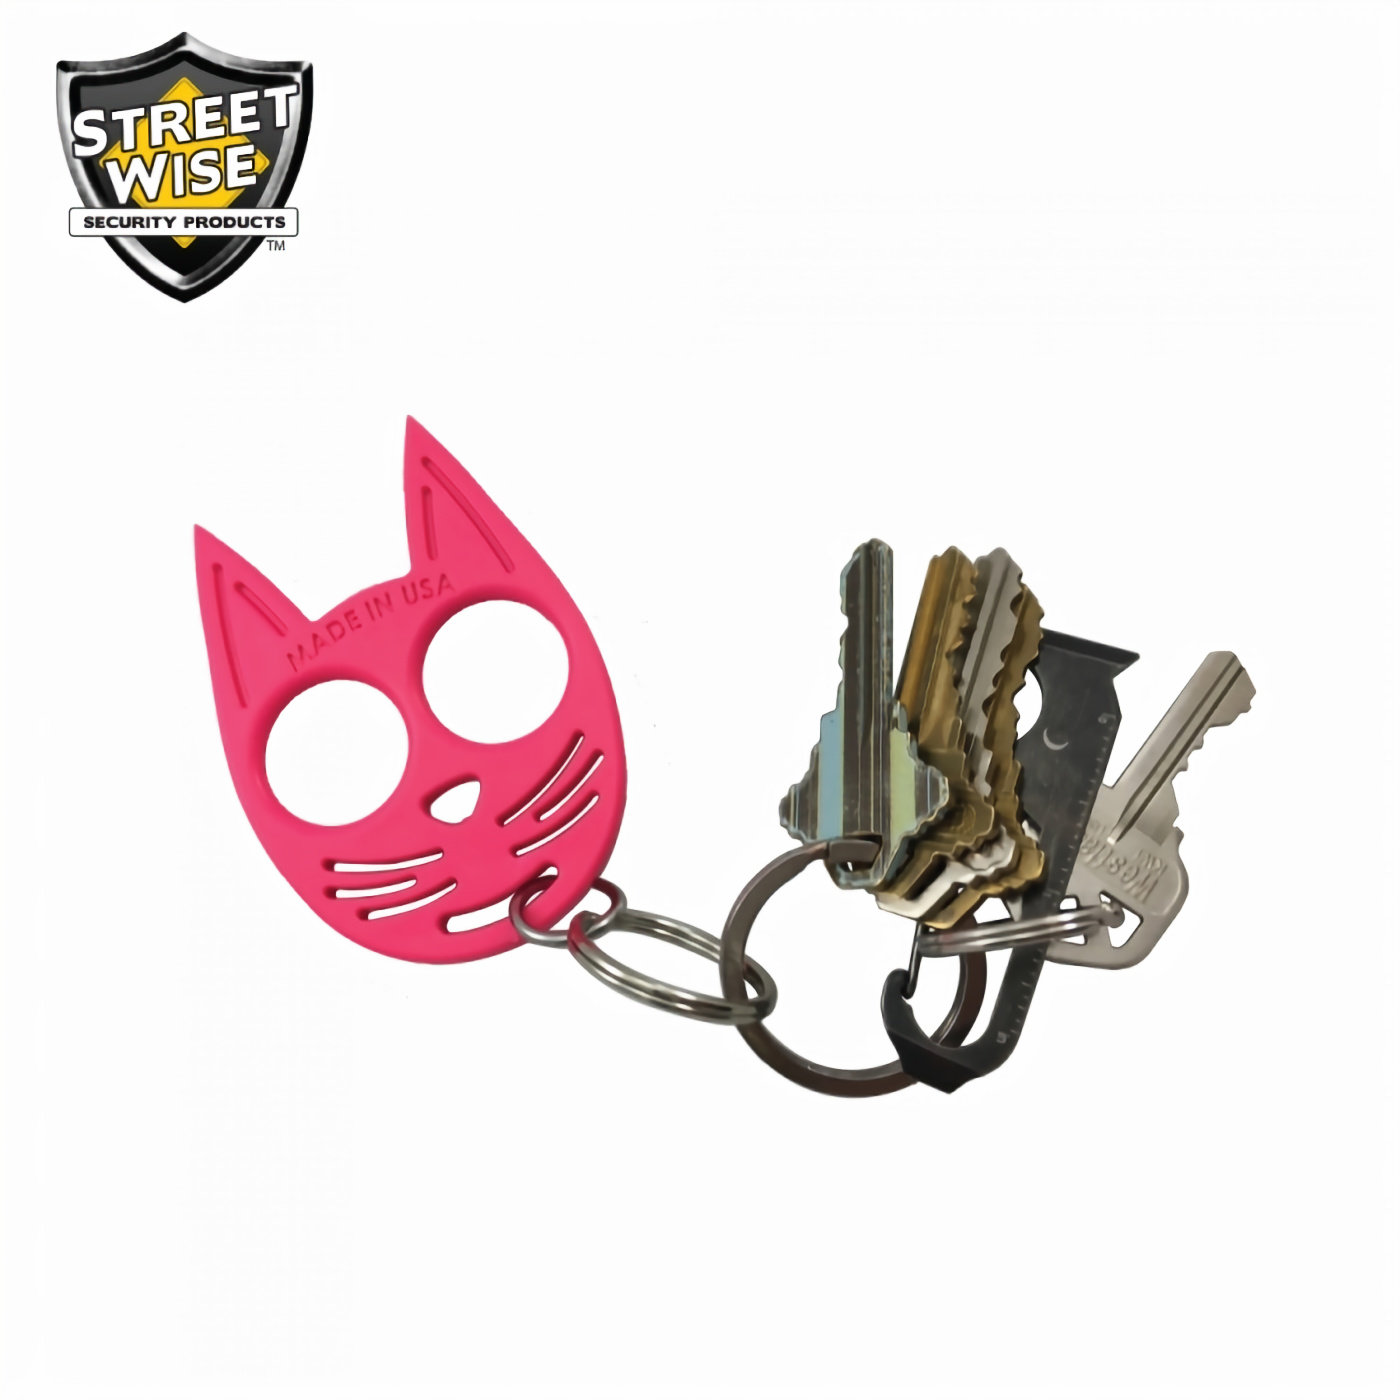 Streetwise My Kitty Self Defense Keychain E3pds